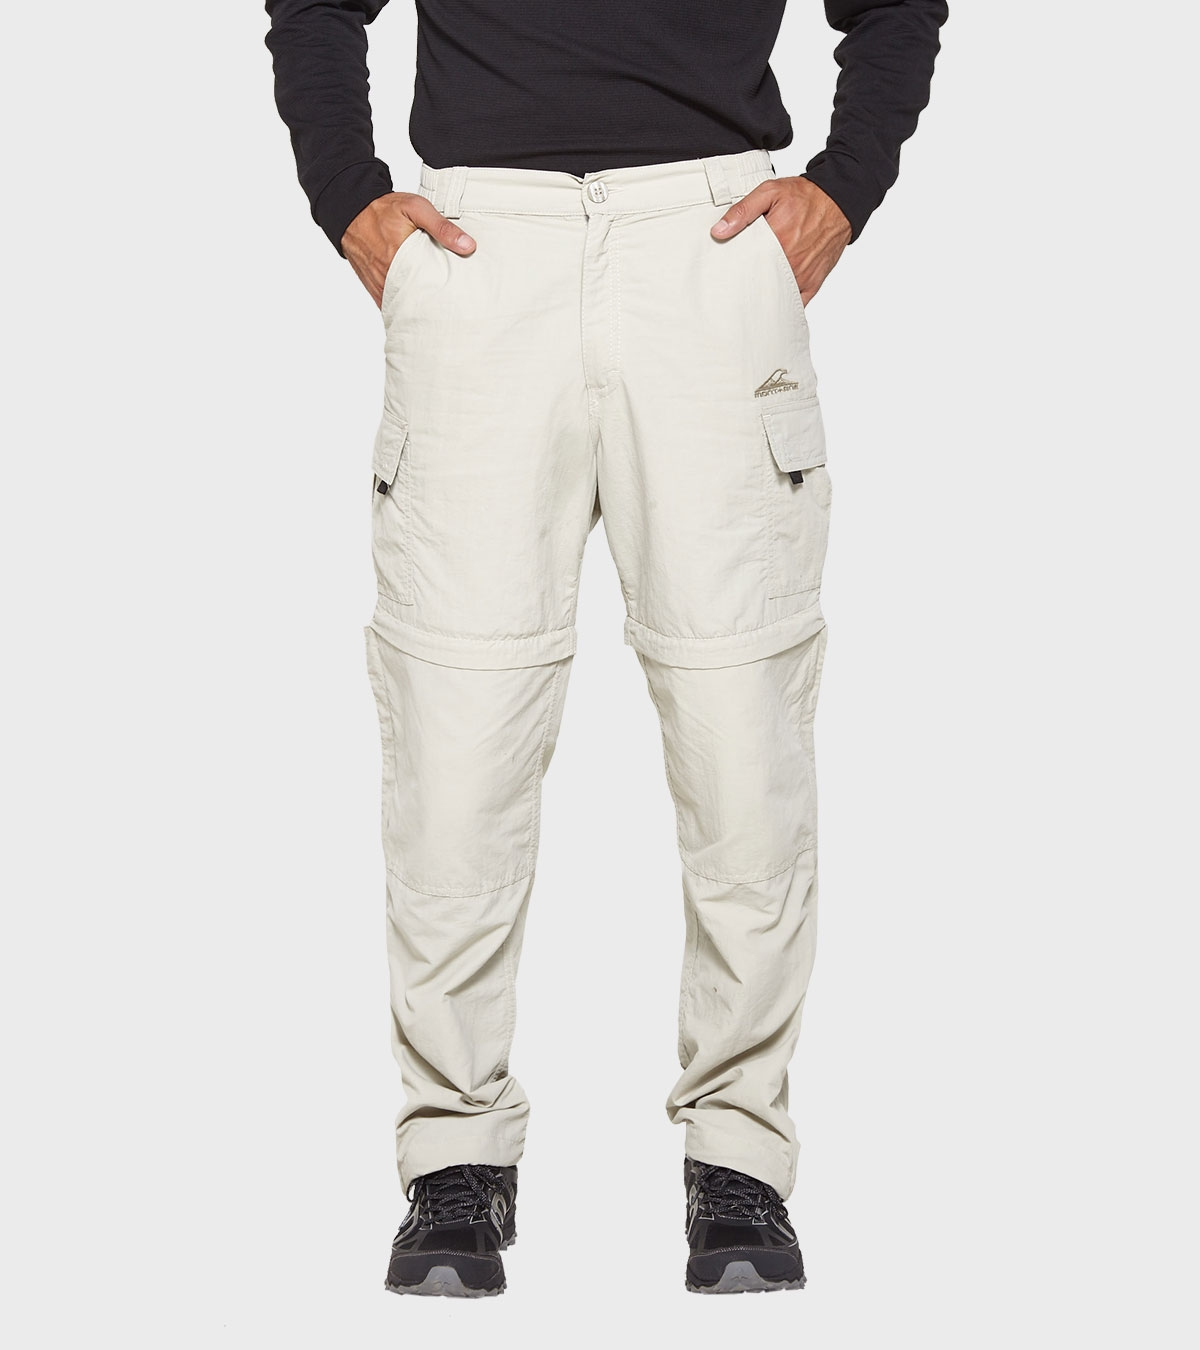 Pantalon De Hombre Sherpa Desmontable